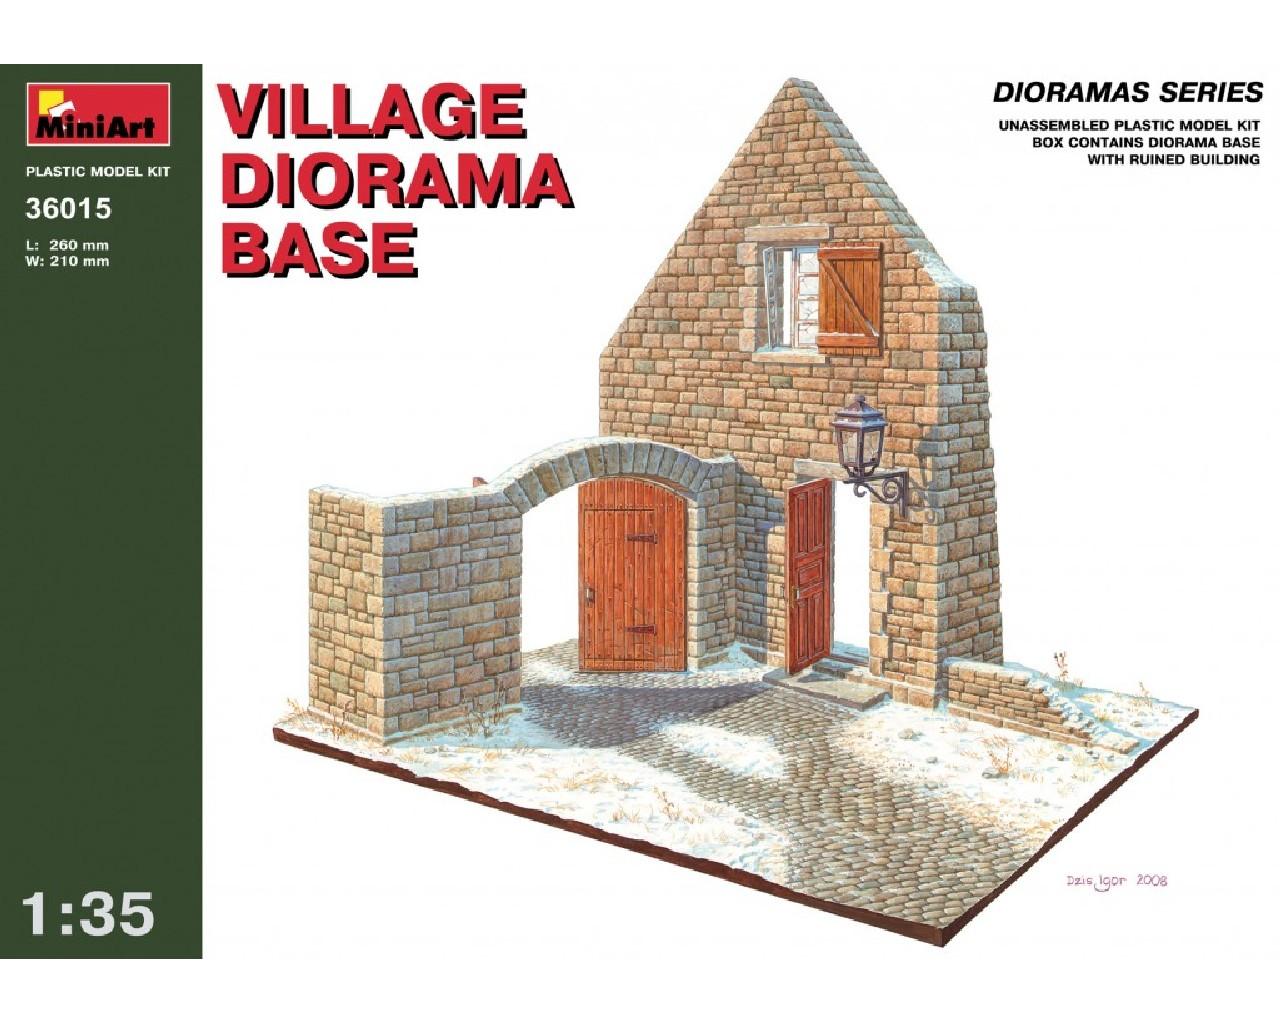 1/35 Village Diorama Base